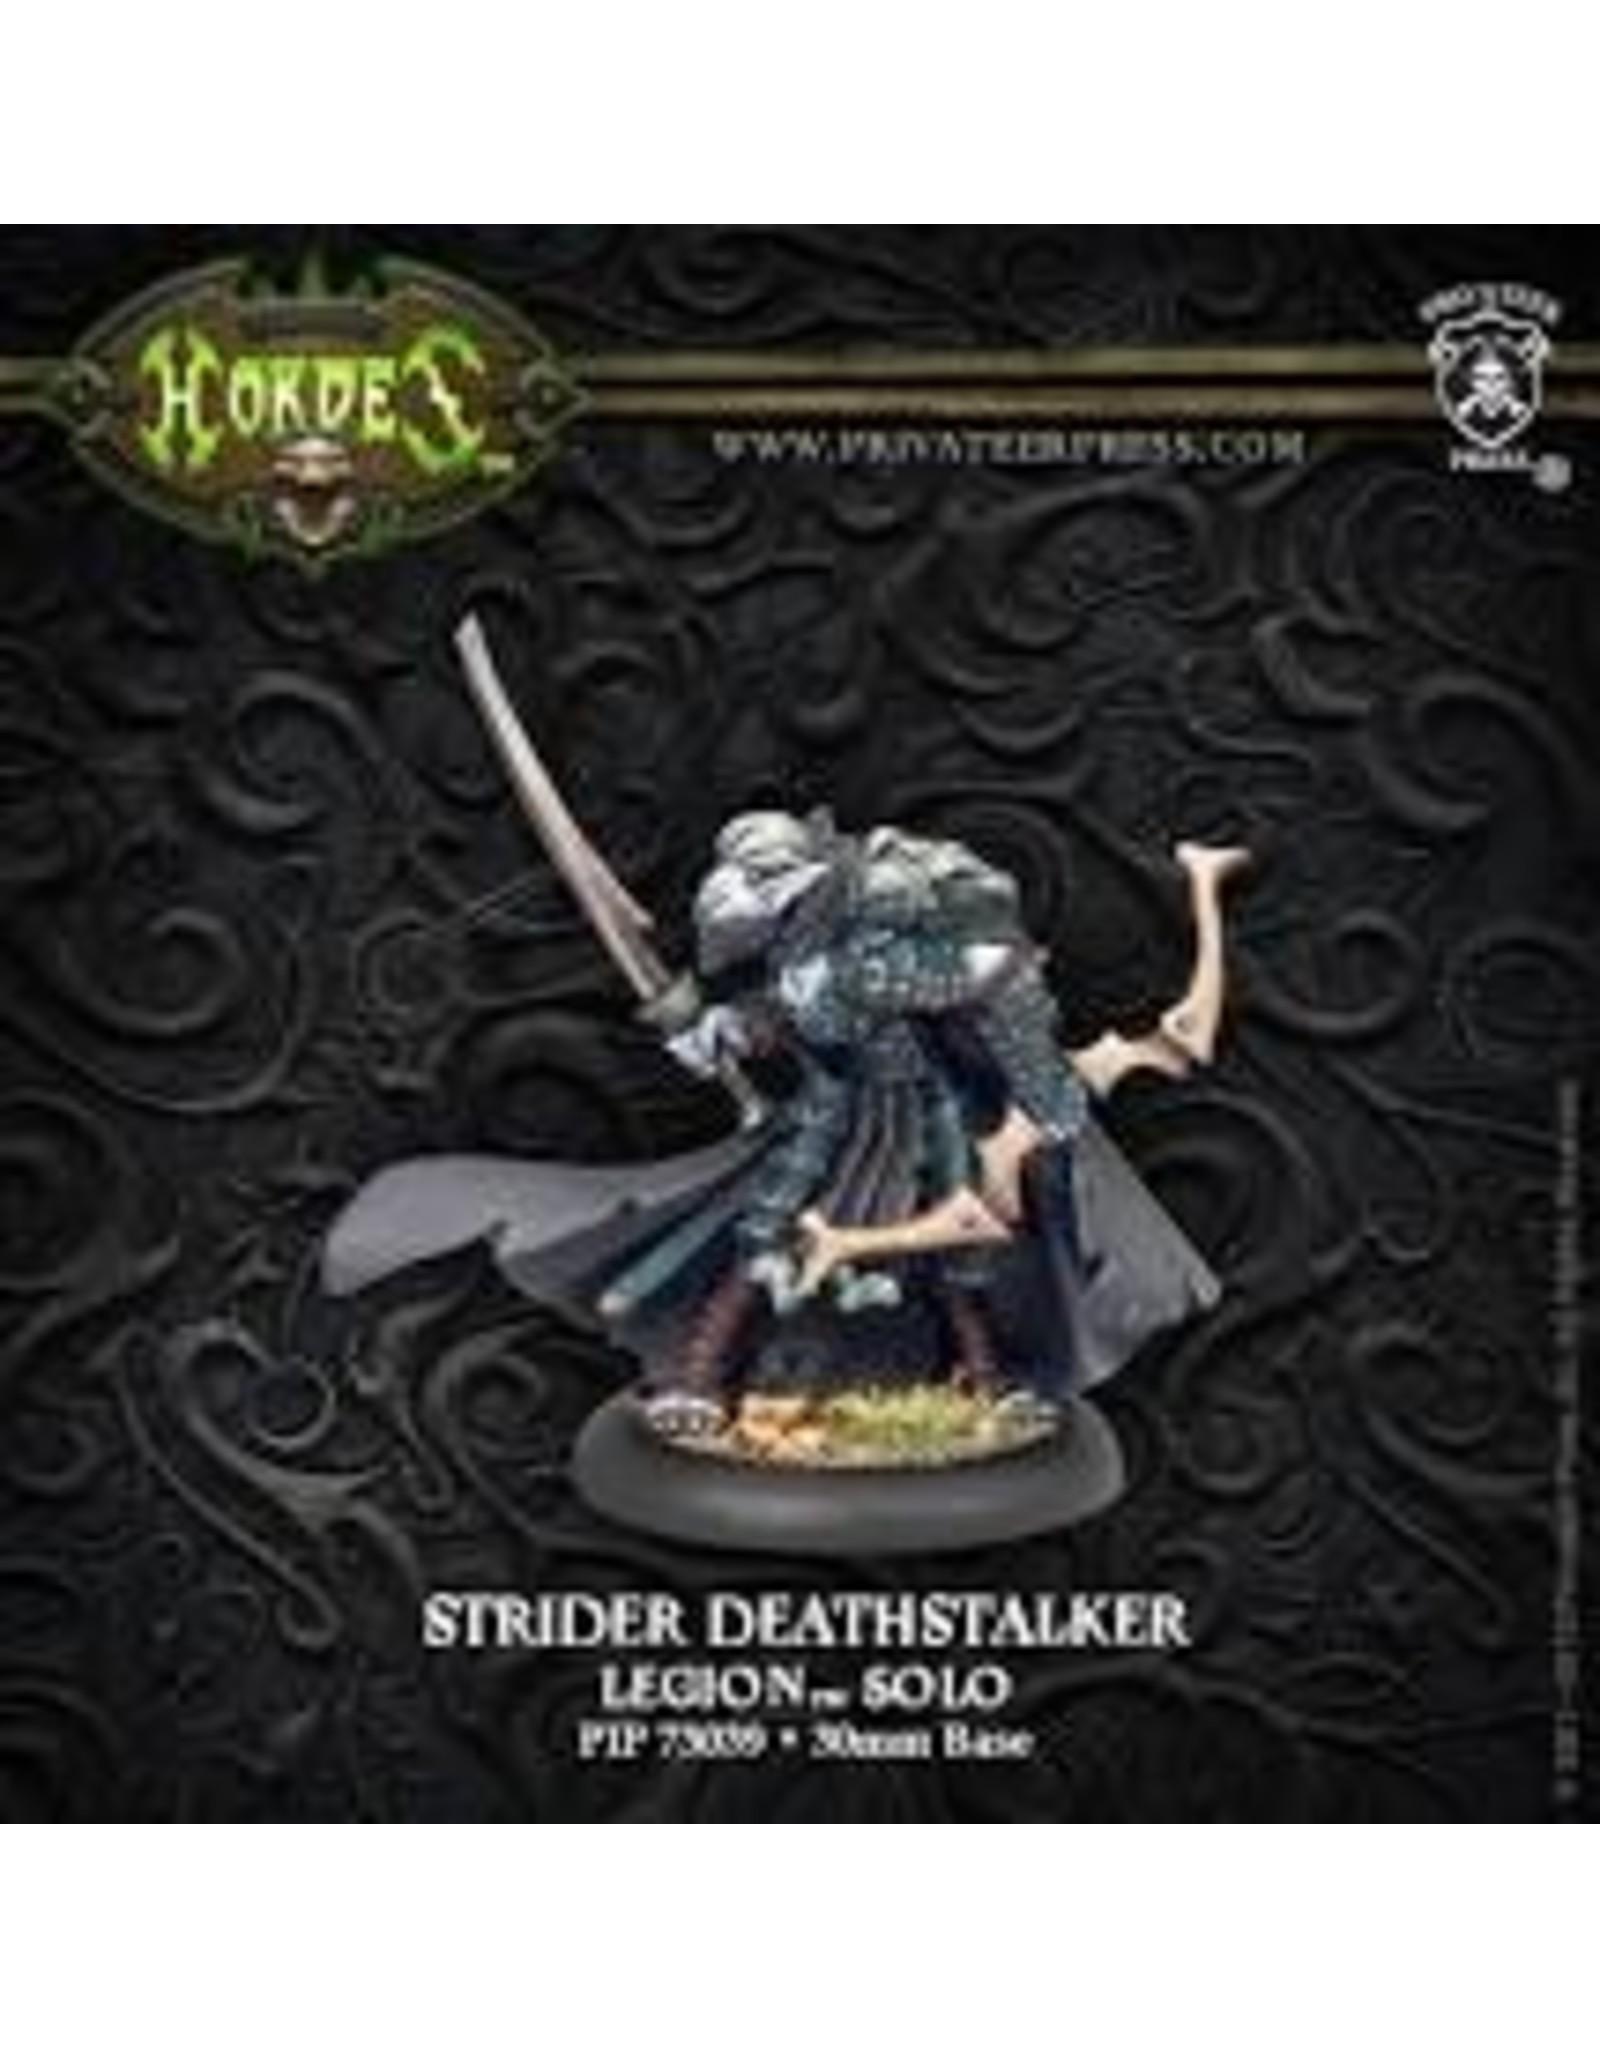 Hordes: Legion of Everblight Strider Deathstalker Blighted Nyss Solo (White Metal)